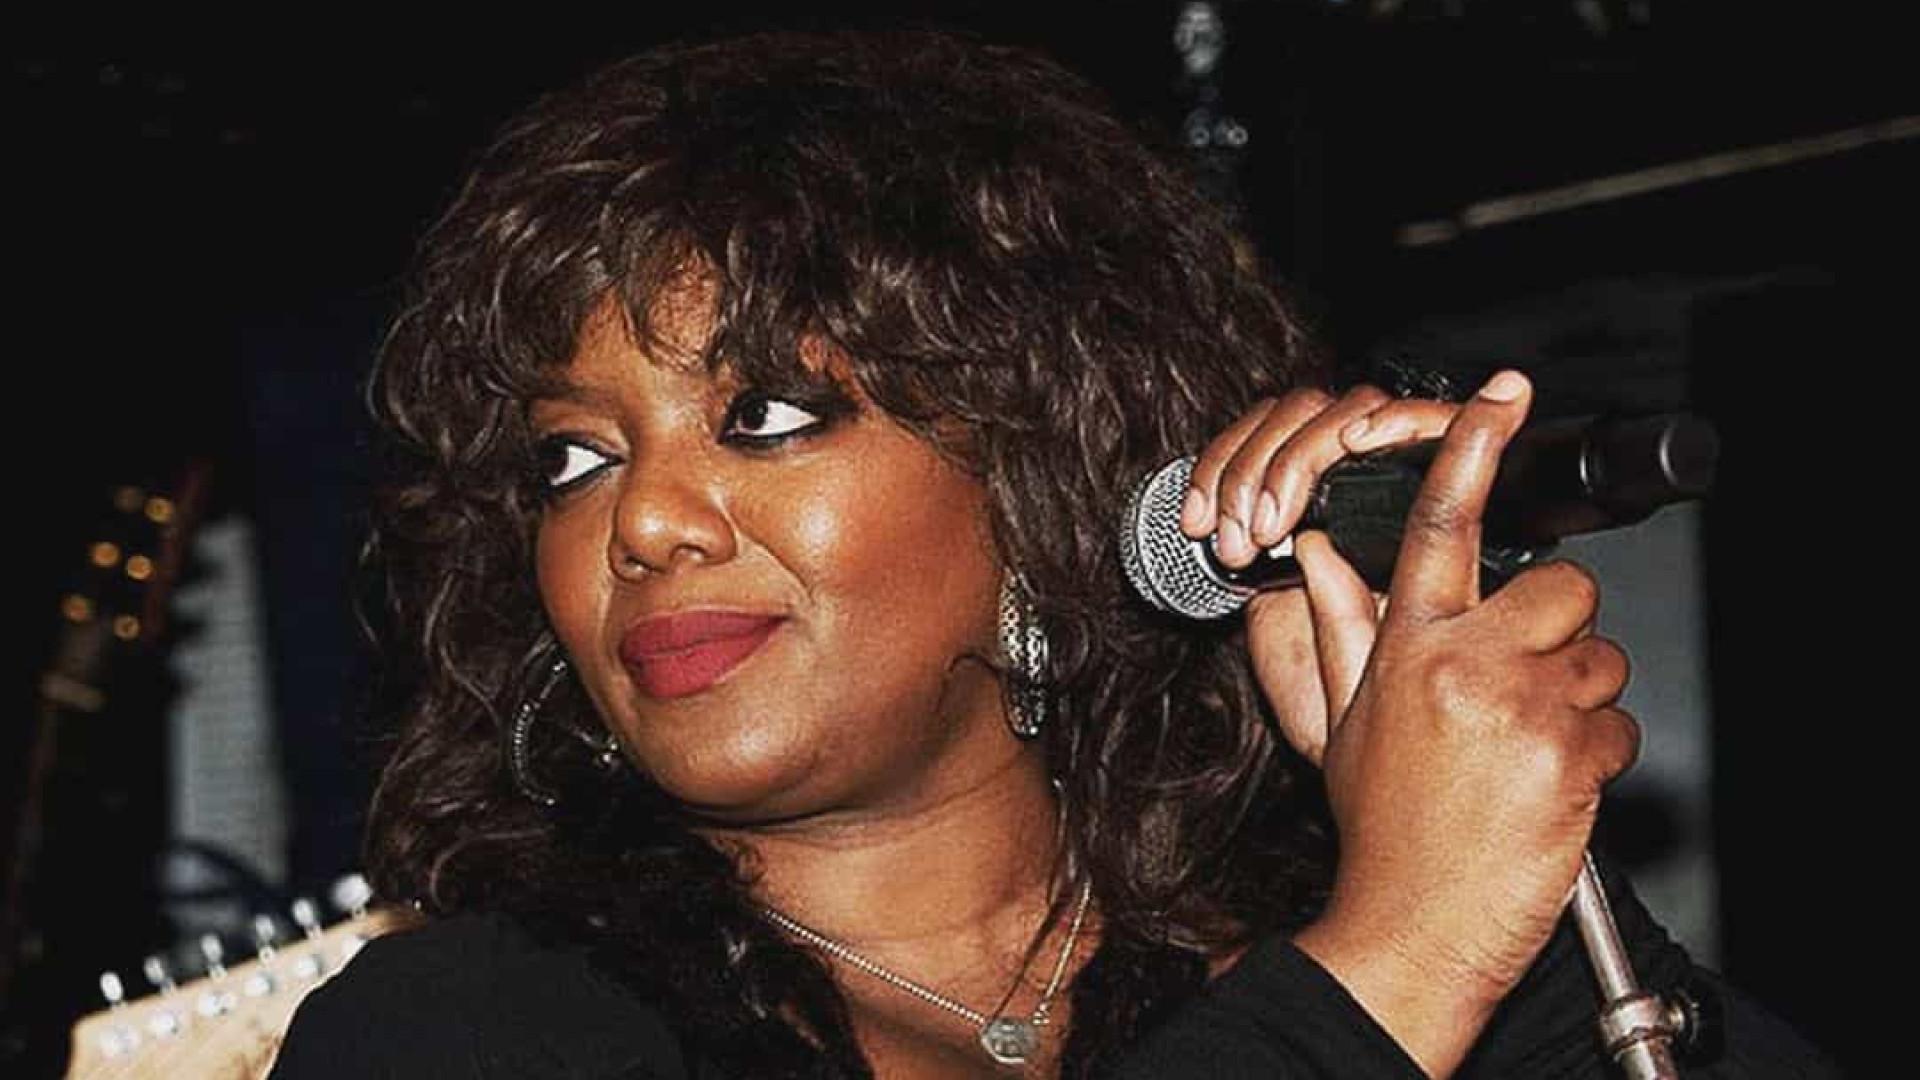 Cantora Denise Johnson, de Primal Scream e New Order, morre aos 53 anos